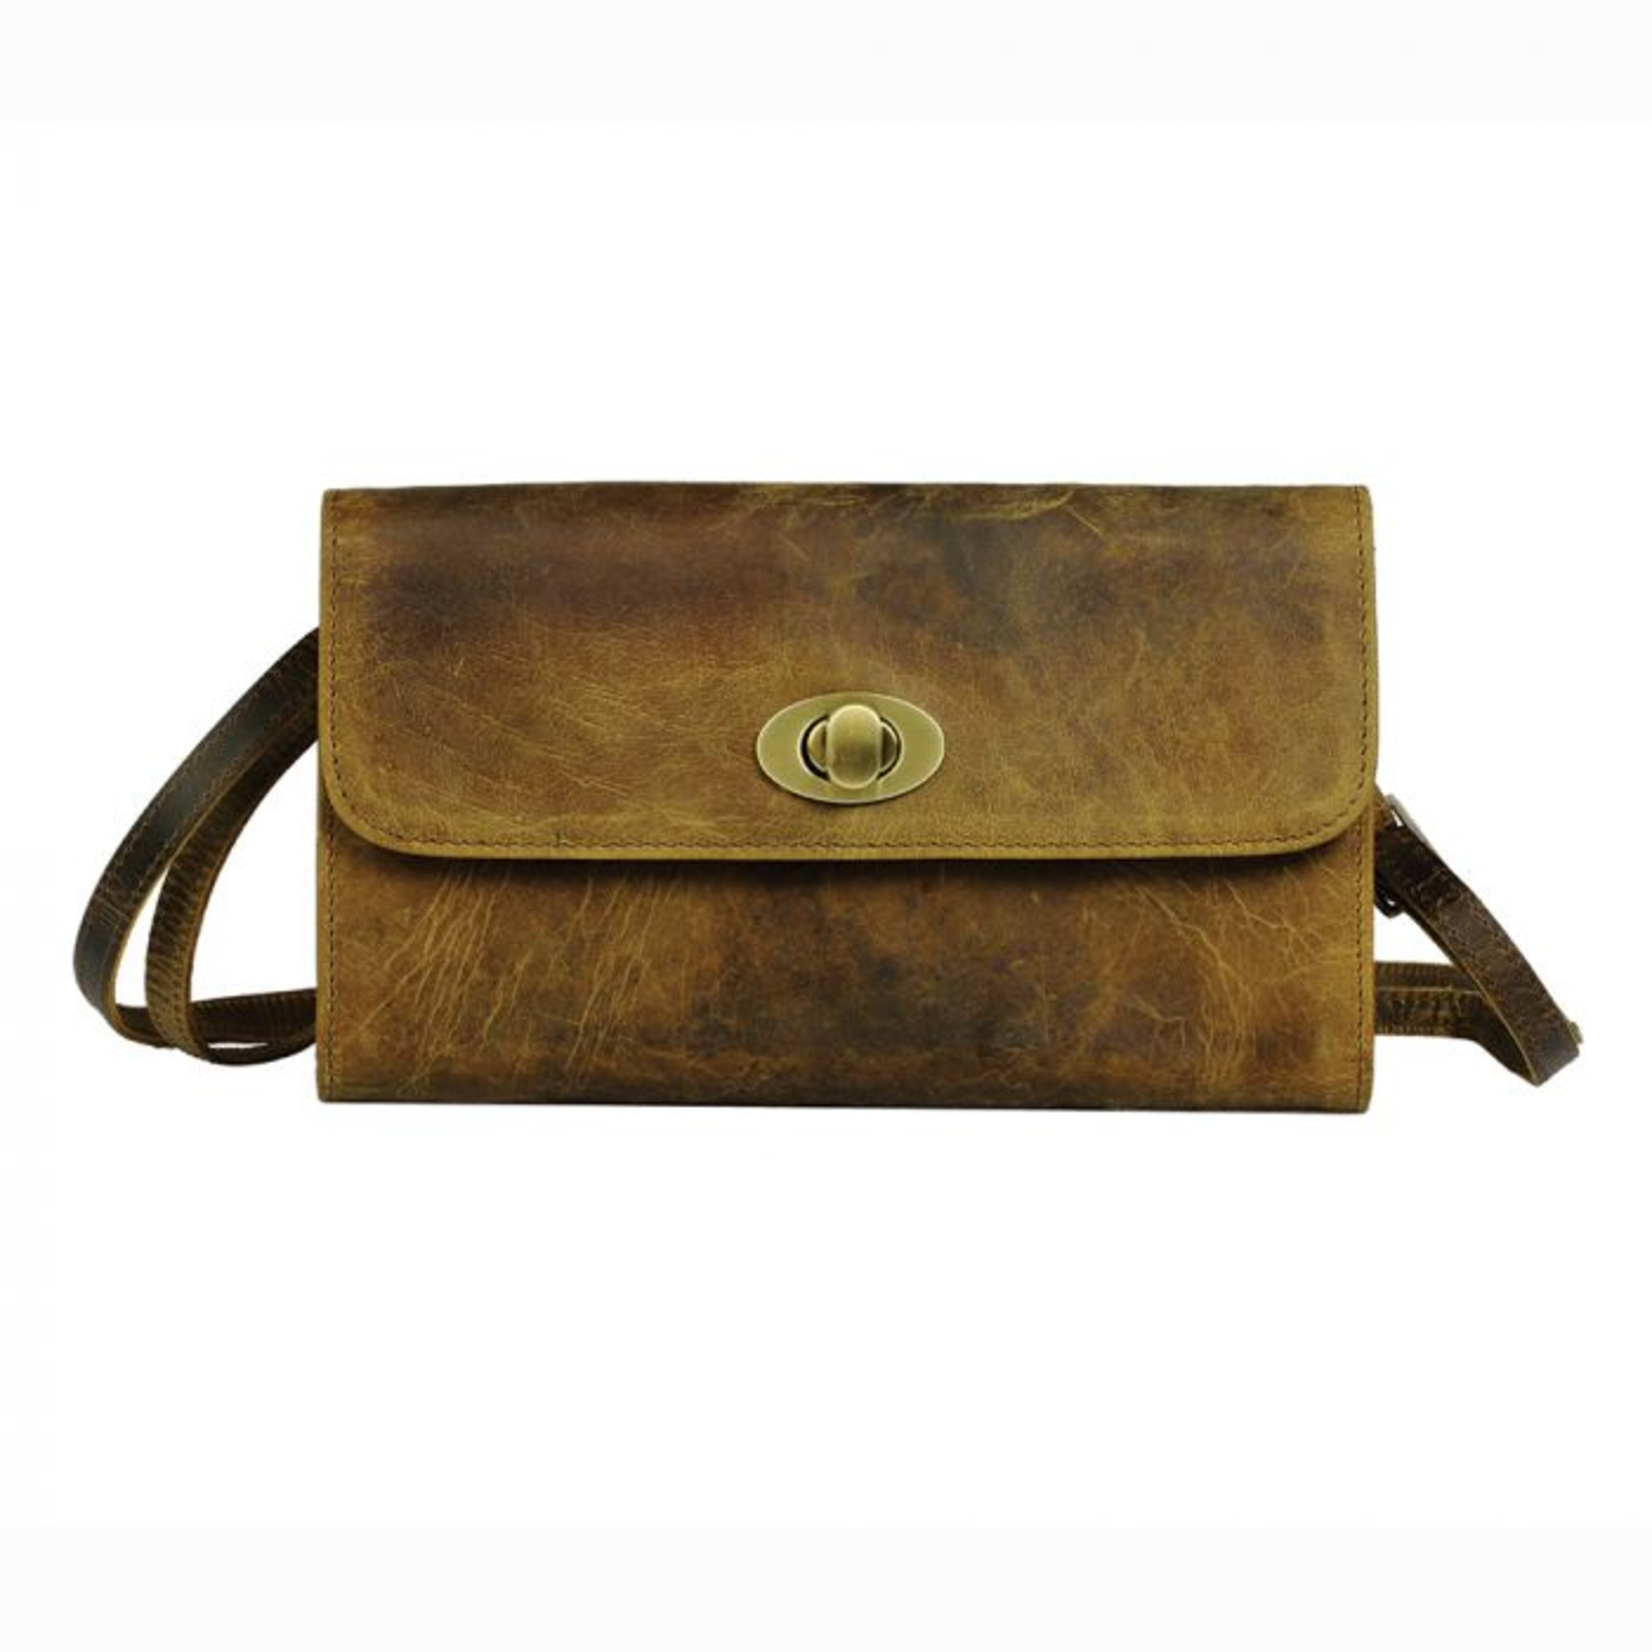 Myra Bag Wallet: Beige Matte